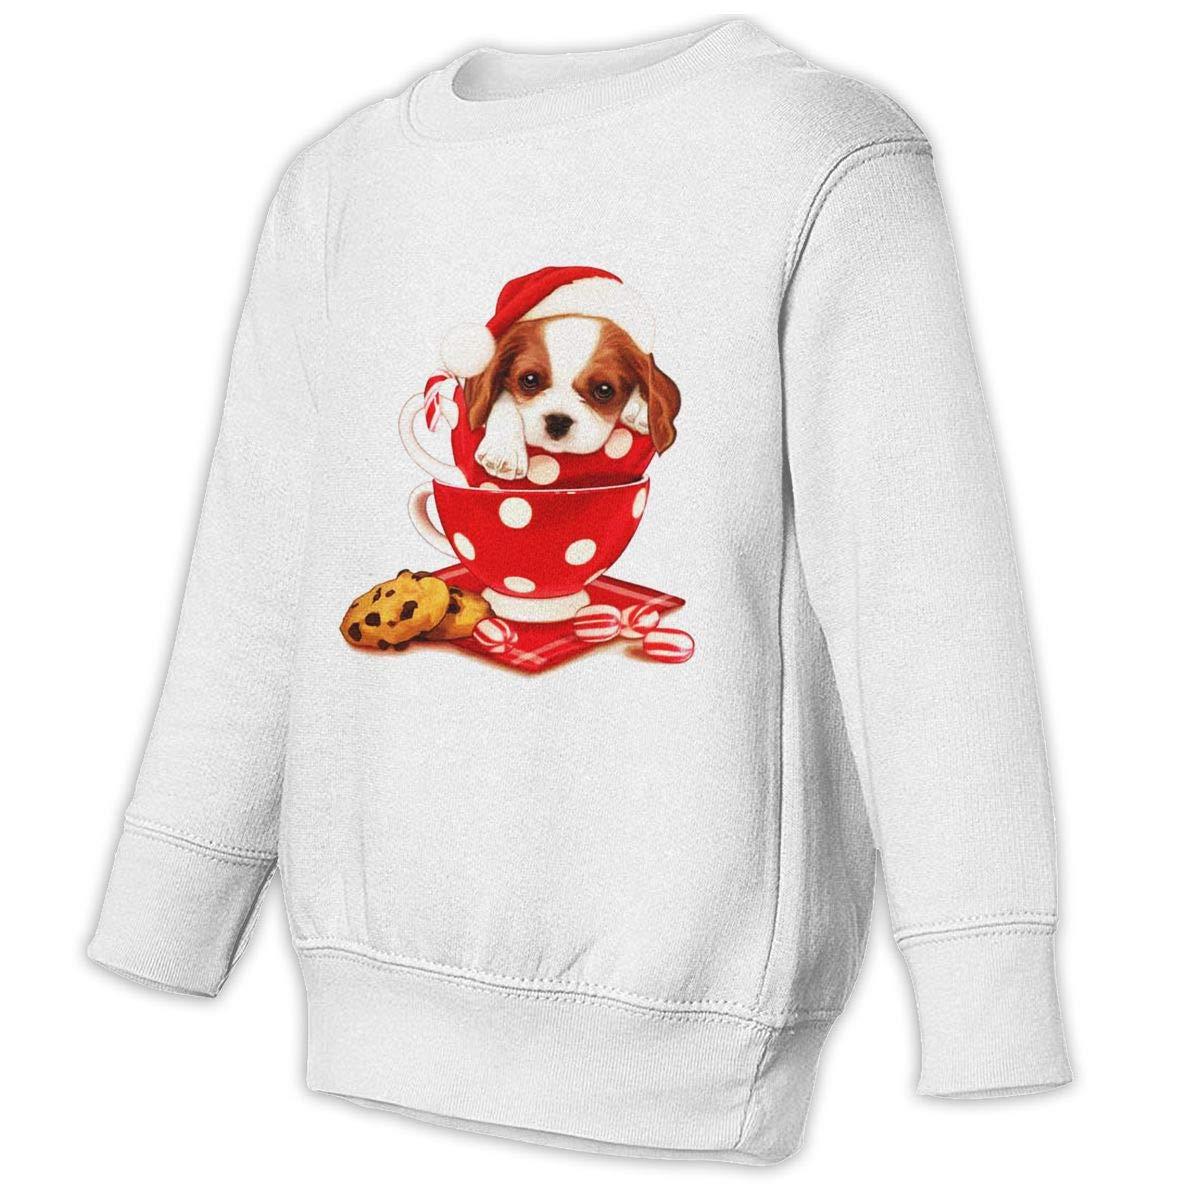 NMDJC CCQ Christmas Puppy Baby Sweatshirt Lovely Juvenile Hoodies Comfortable T Shirts